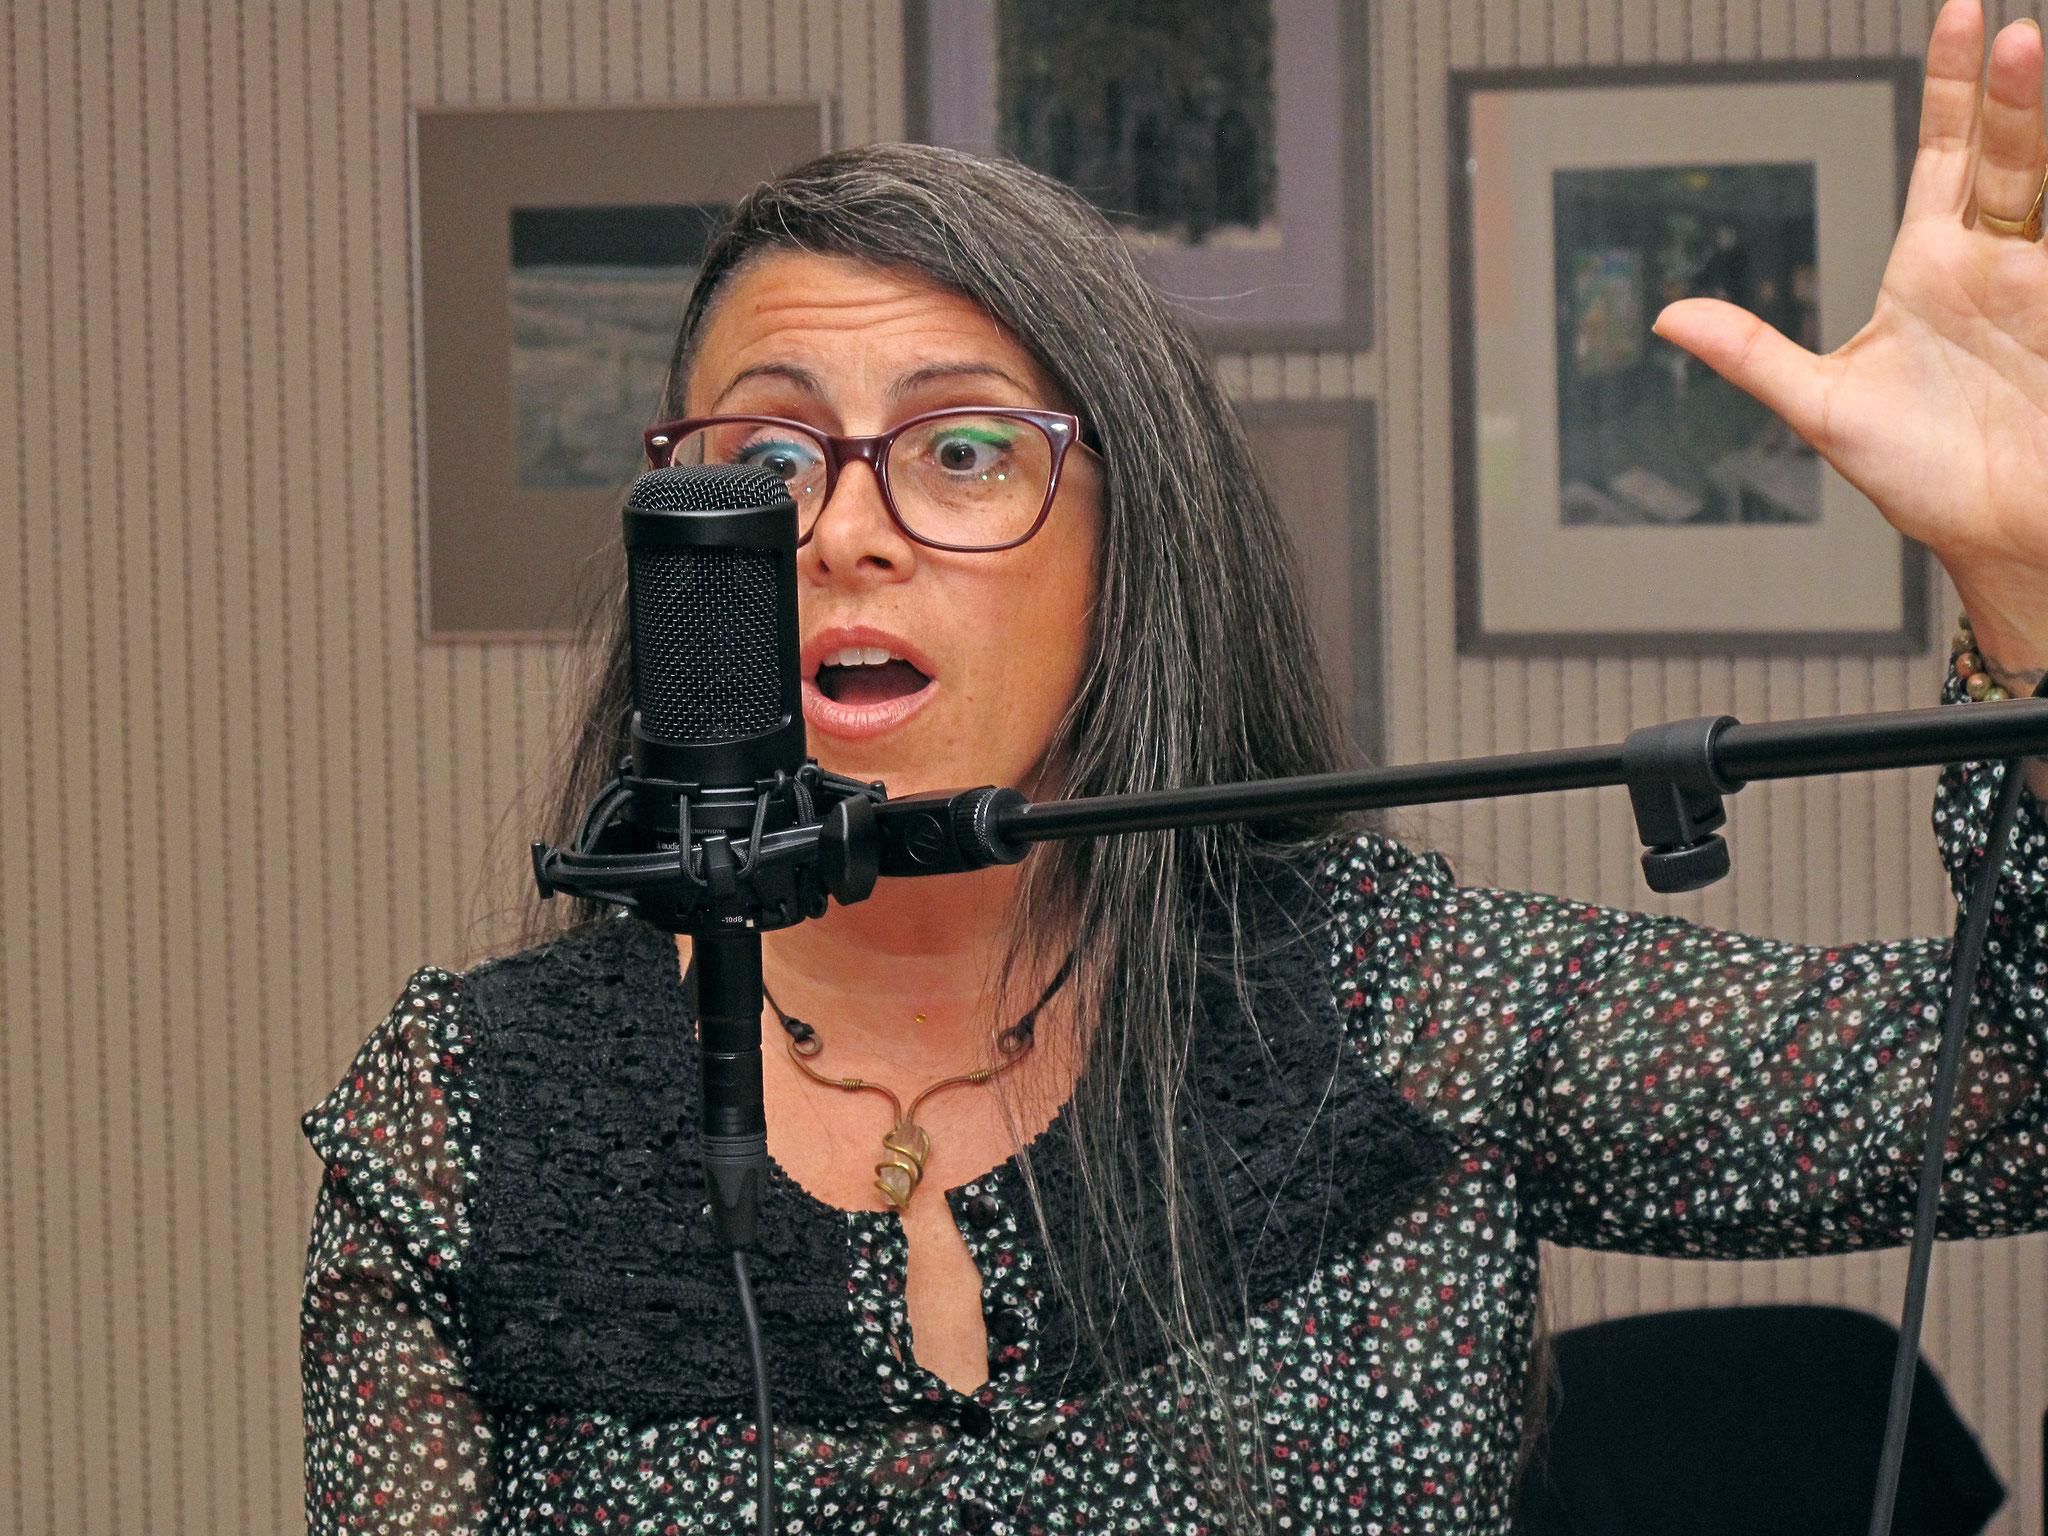 Genesina-Mara Cazzato erzählt Märchen